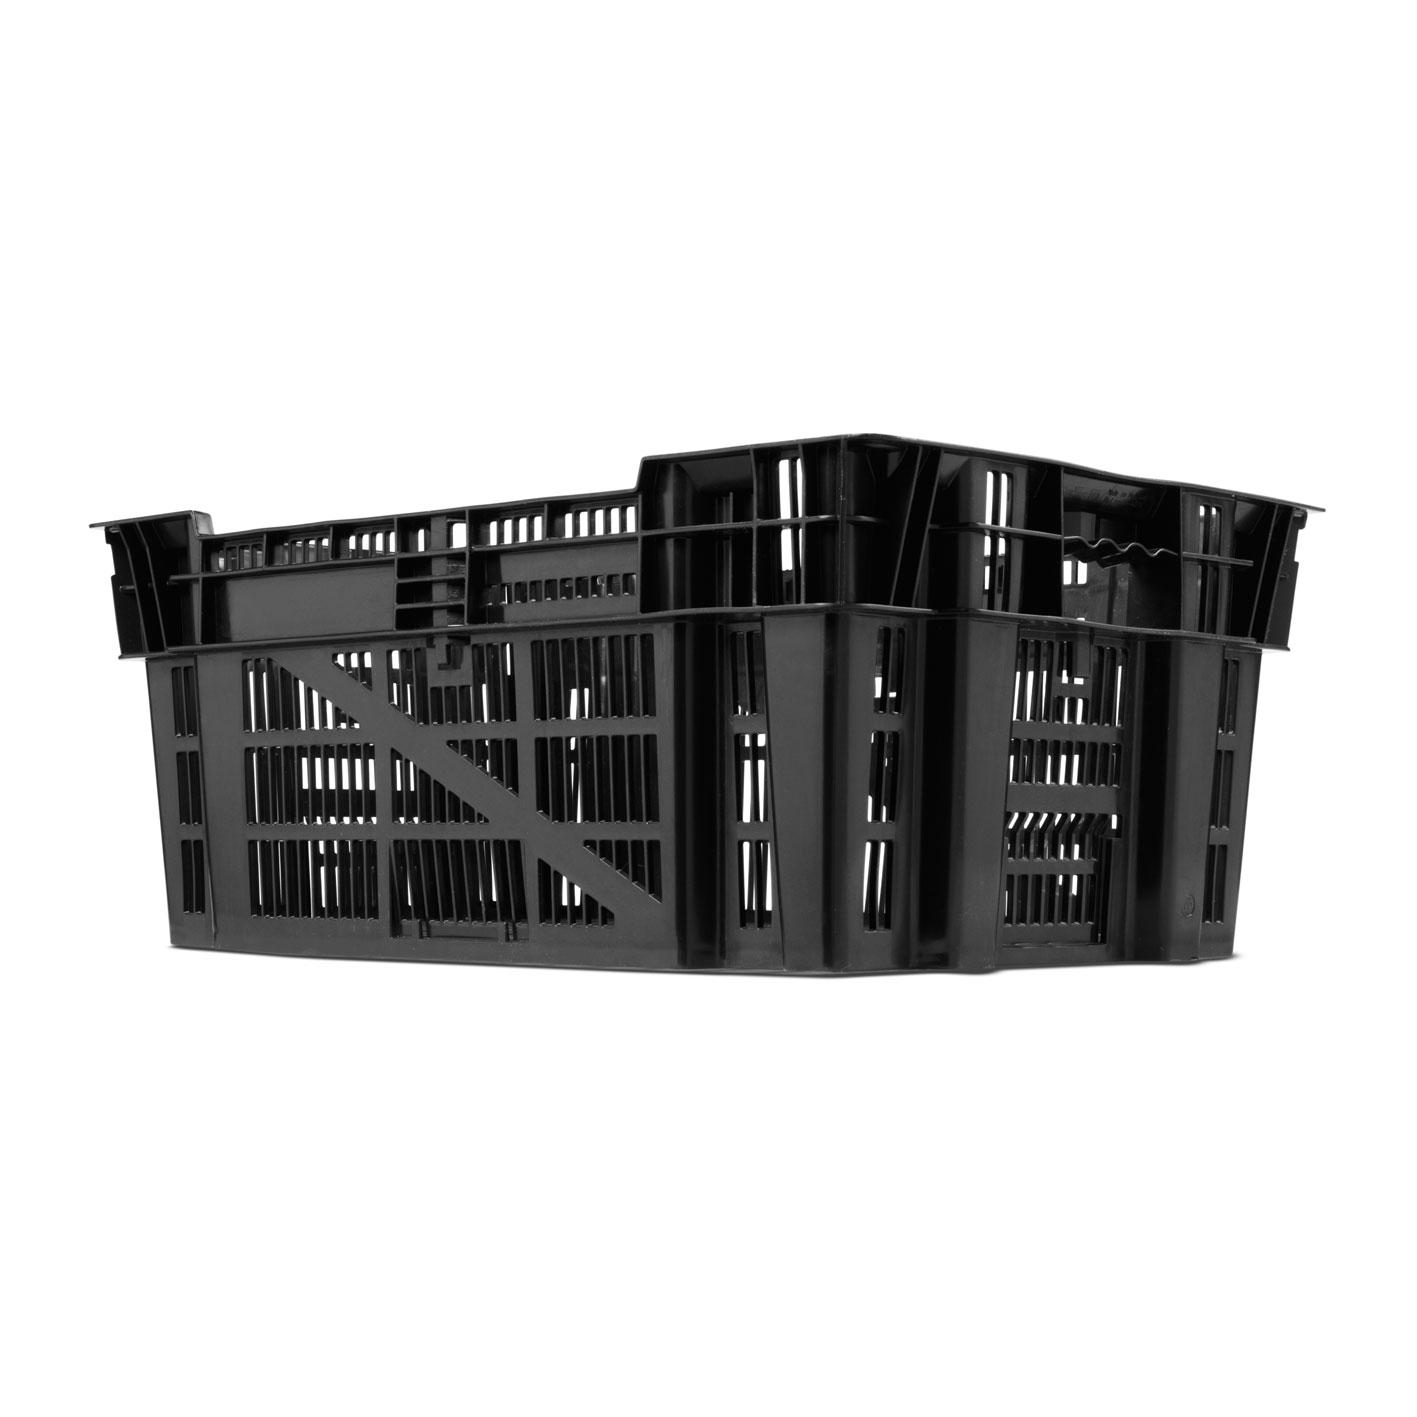 43 liter draai-stapel-nestbare kist